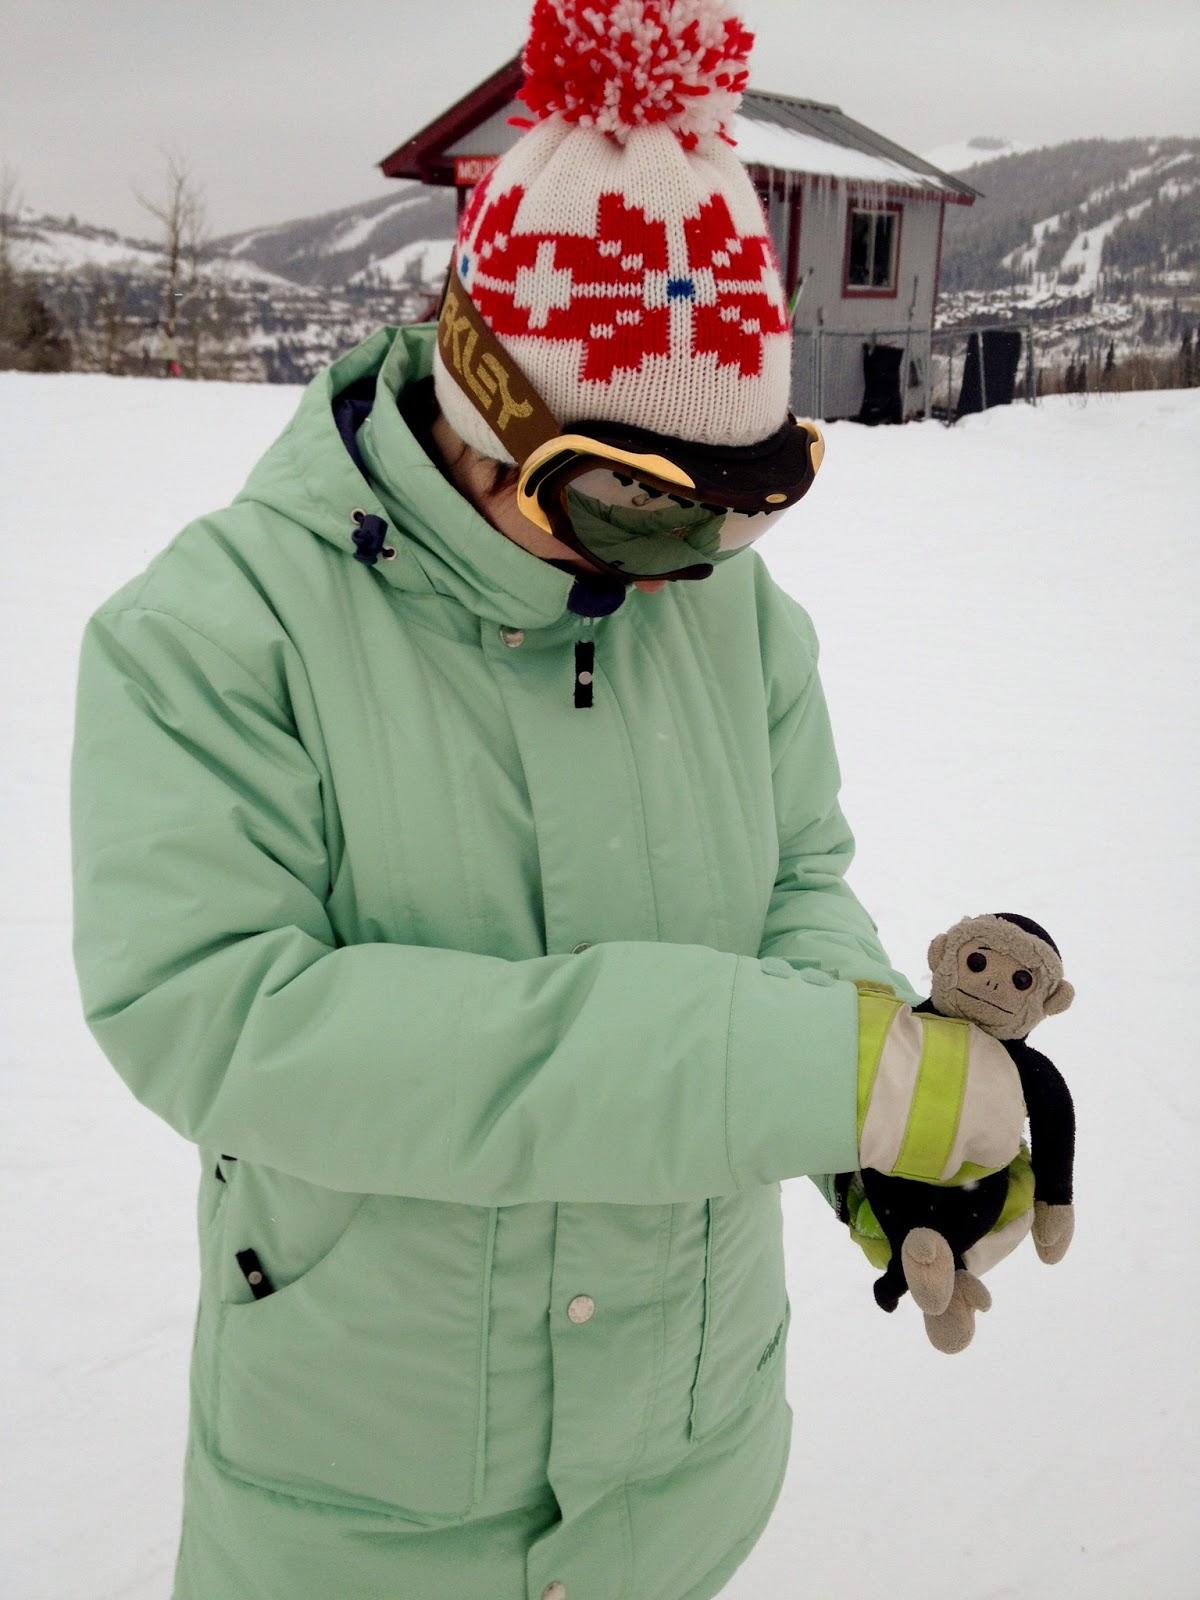 fashion blog, fashion blogger, style blog, style blogger, mens fashion, mens fashion blog, mens style, mens style blog, womens style blog, anthropologie ootd blog, anthropologie ootd, anthropologie, ootd, mens ootd, womens ootd, snow, snowboarding, canyons, park city, utah ski resort, park city ski resort,